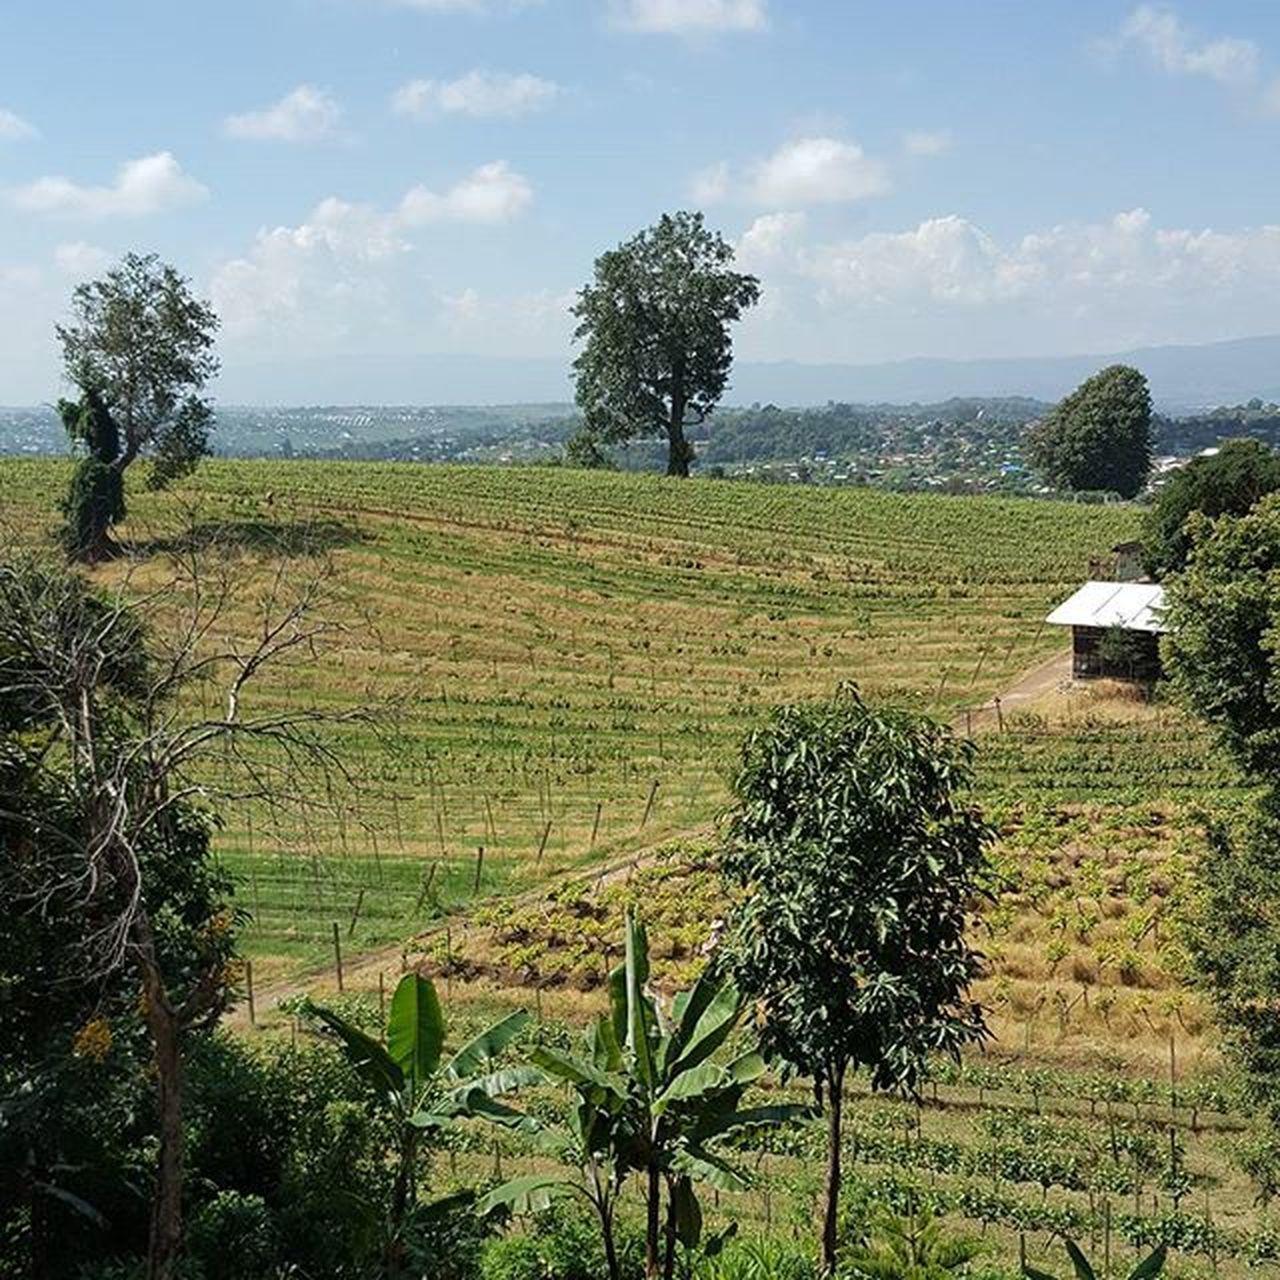 Myanmar Taunggyi Scenery Nature Awaken your senses with the beauty of nature Vineyard